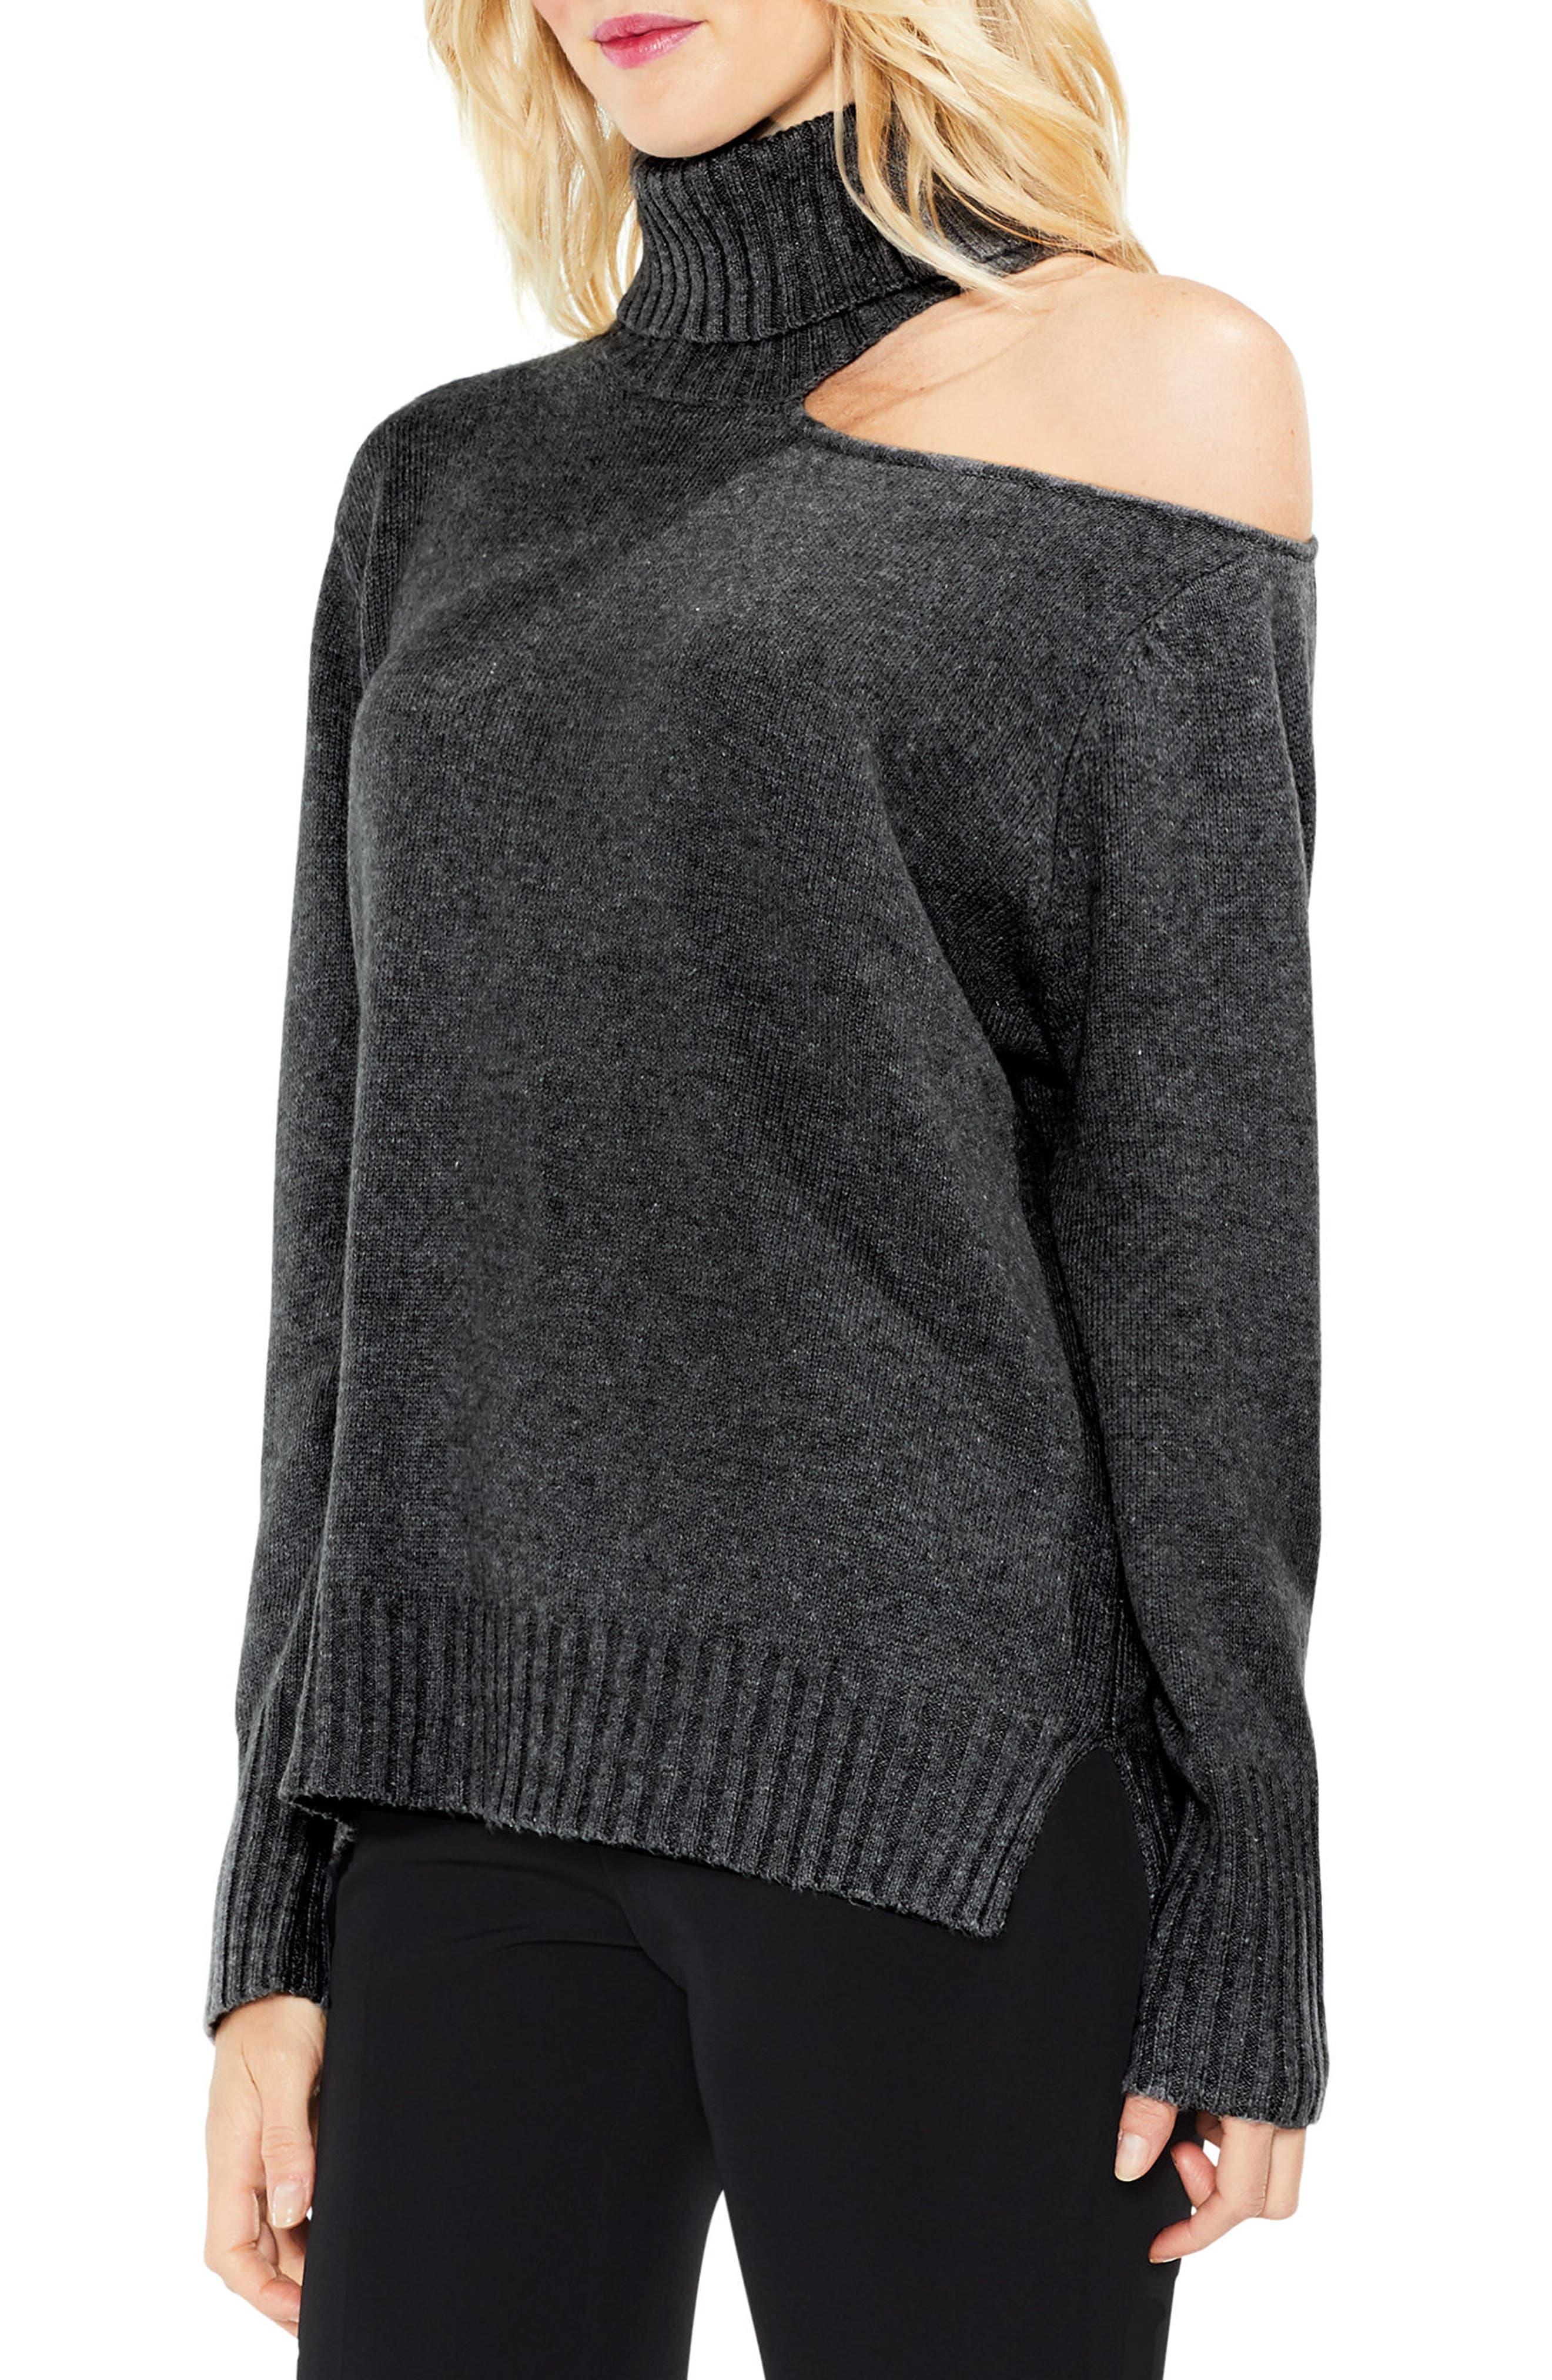 Vince Camuto Asymmetrical Cold Shoulder Turtleneck Sweater